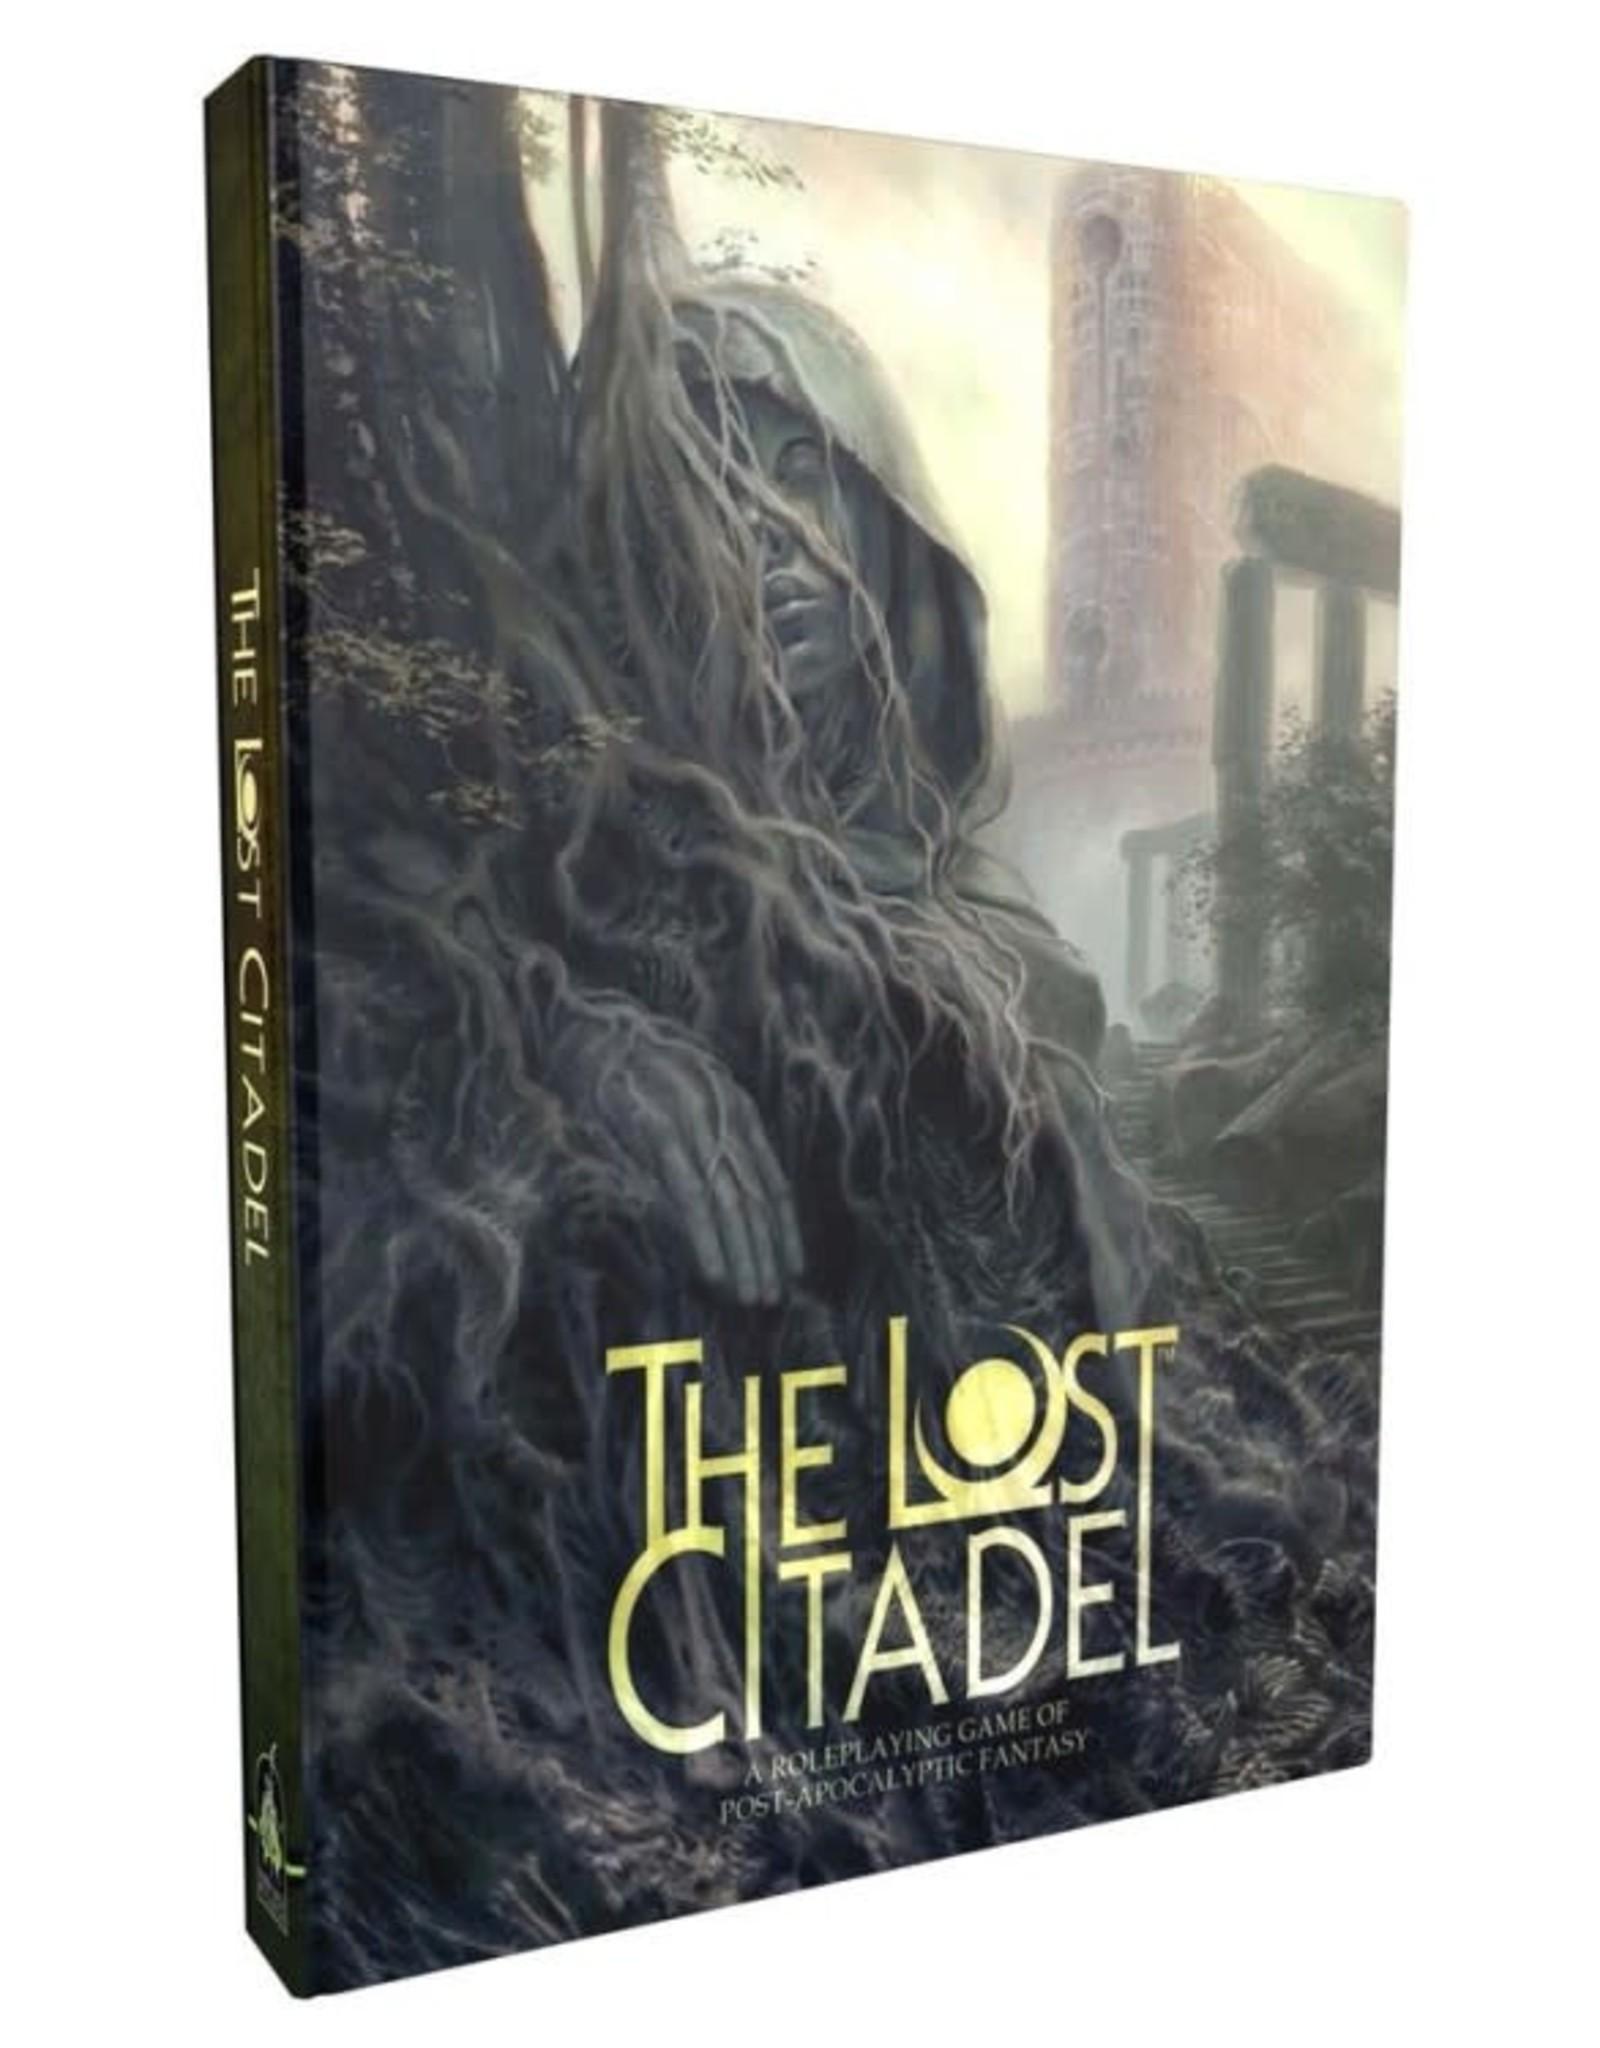 Green Ronin Publishing 5E: Lost Citadel RPG [preorder]